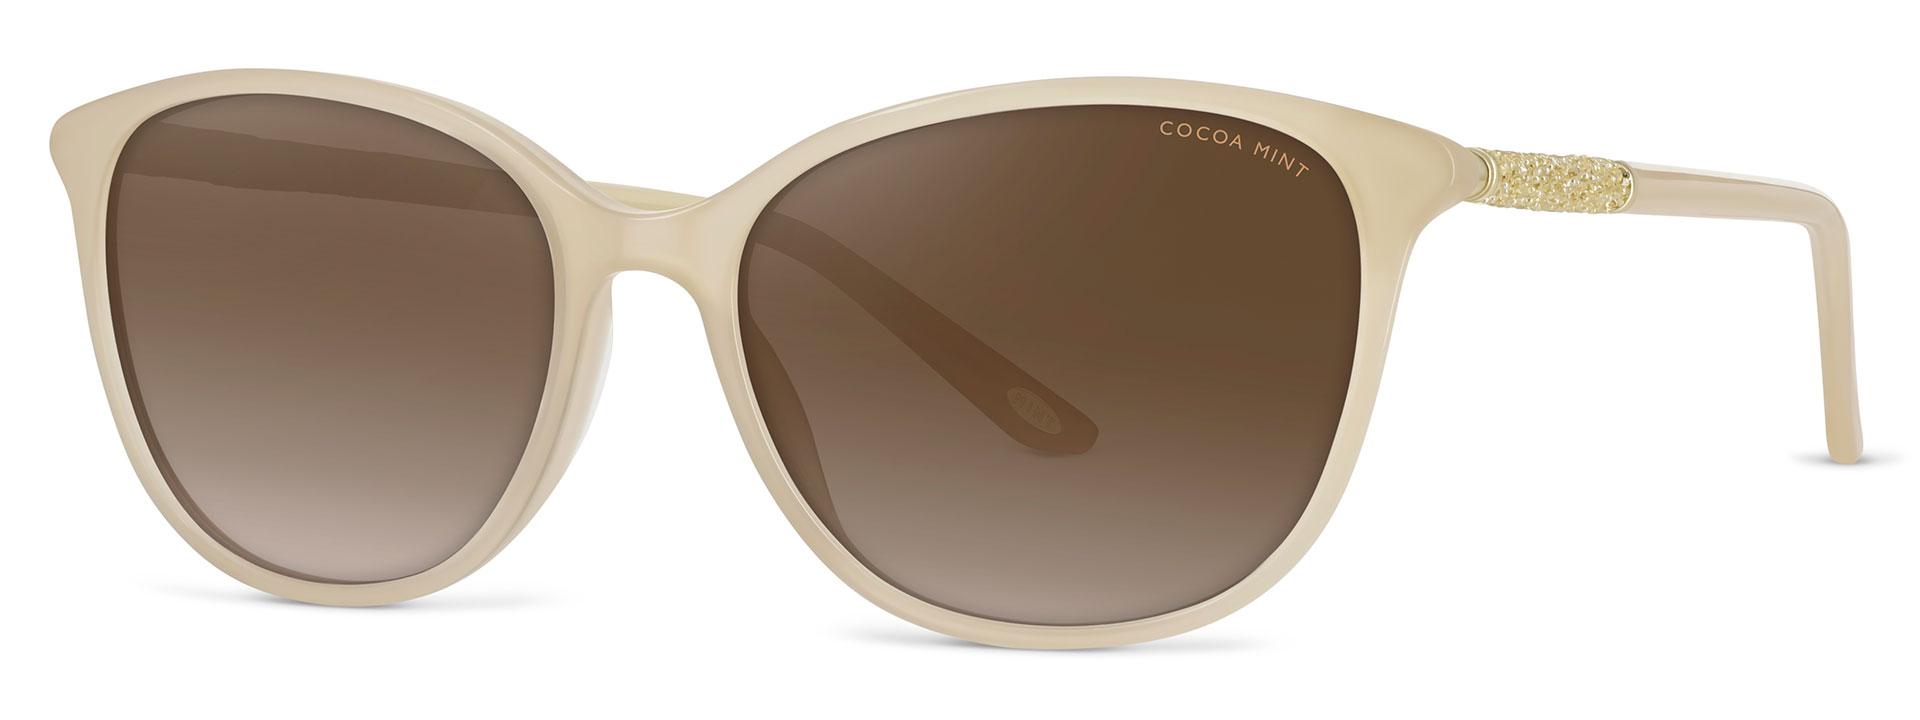 Cocoa Mint Sun Glasses - Nude - CMS2067-C1